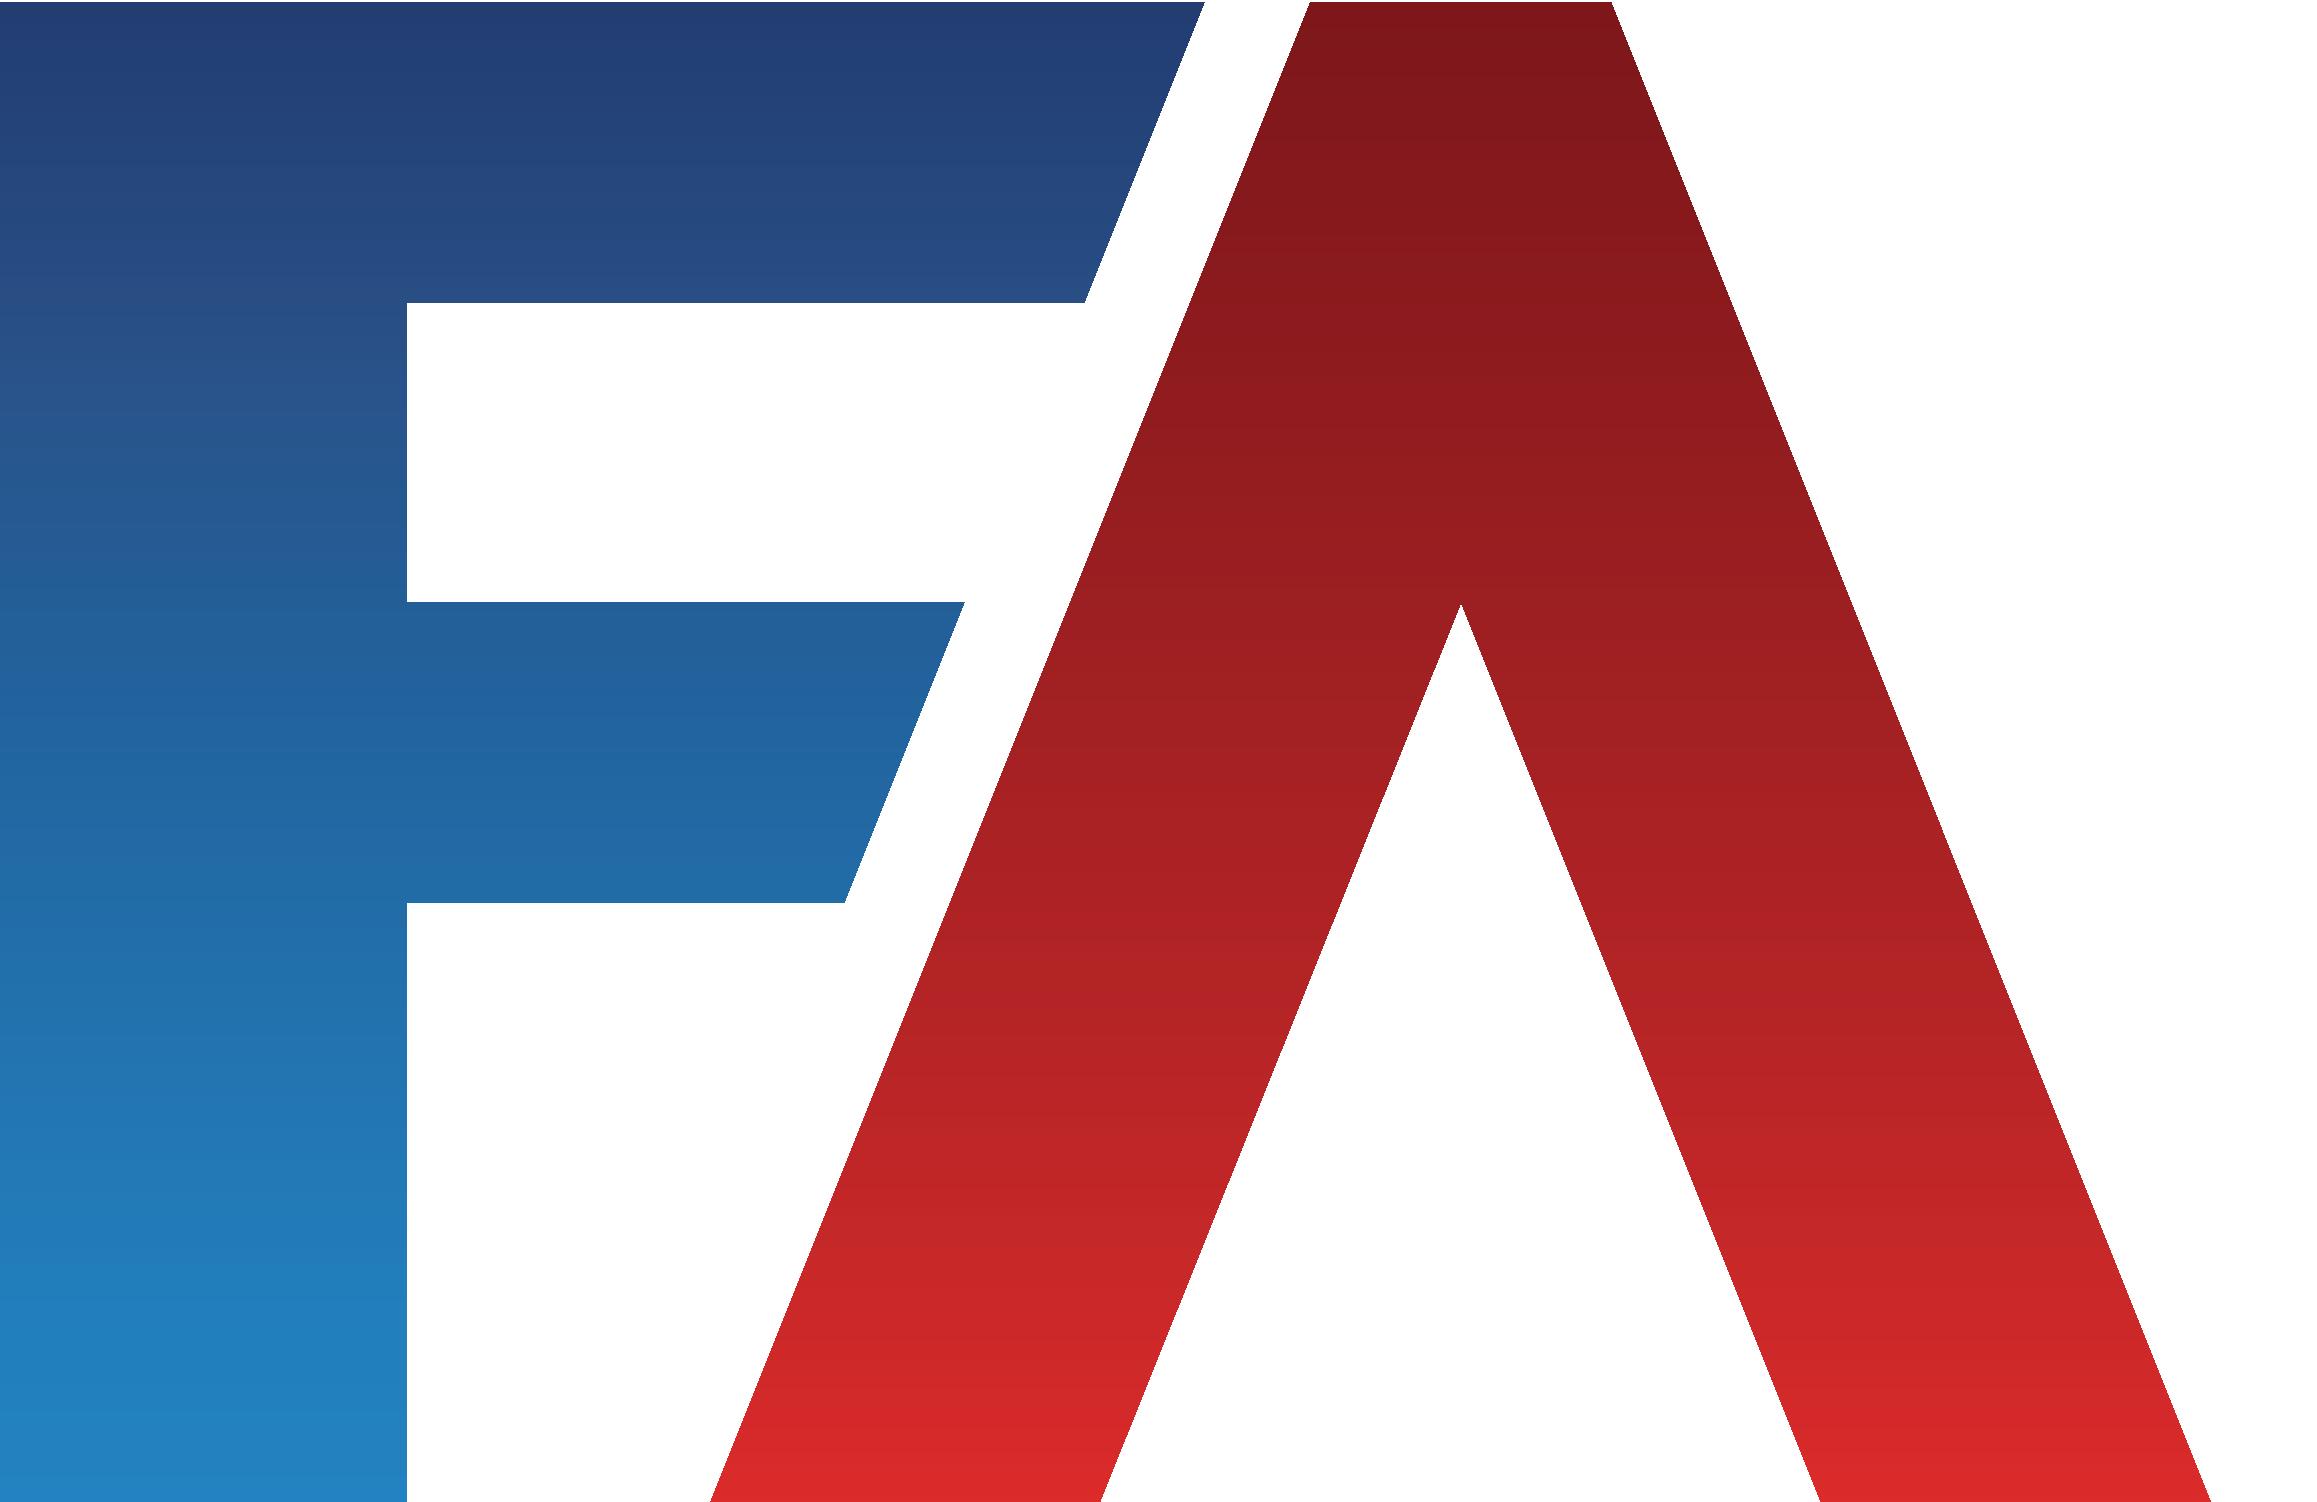 2015 NFL Free Agent Tracker | FantasyAlarm.com